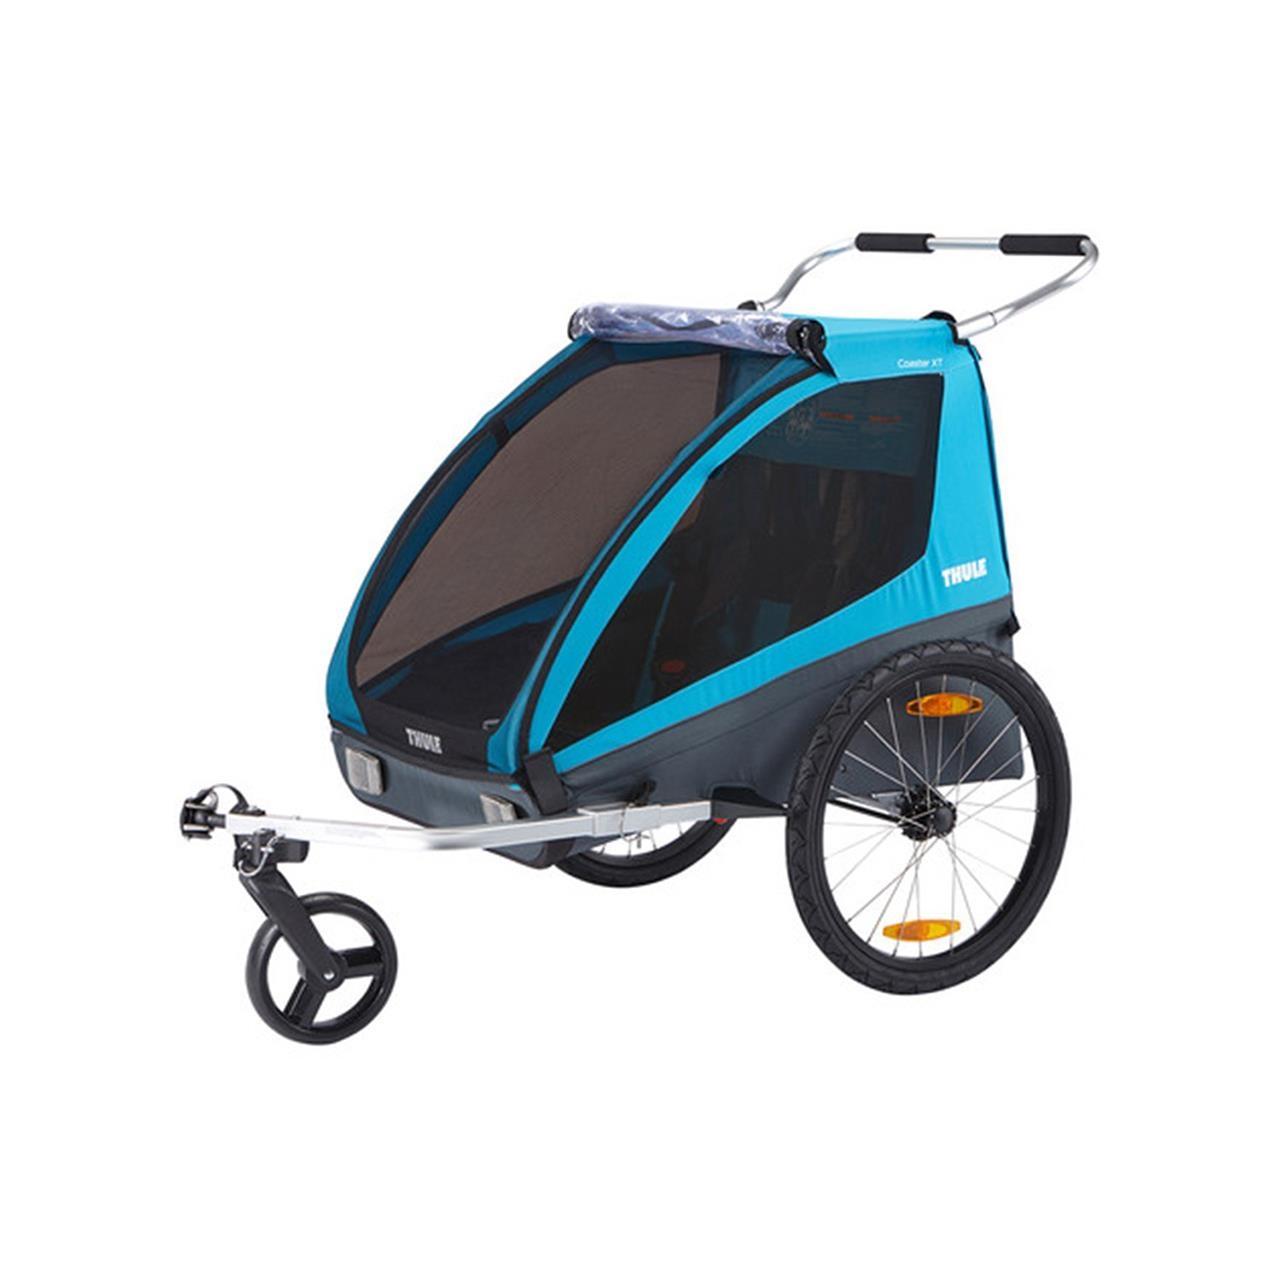 Carucior Chariot Thule Coaster XT Blue 2016